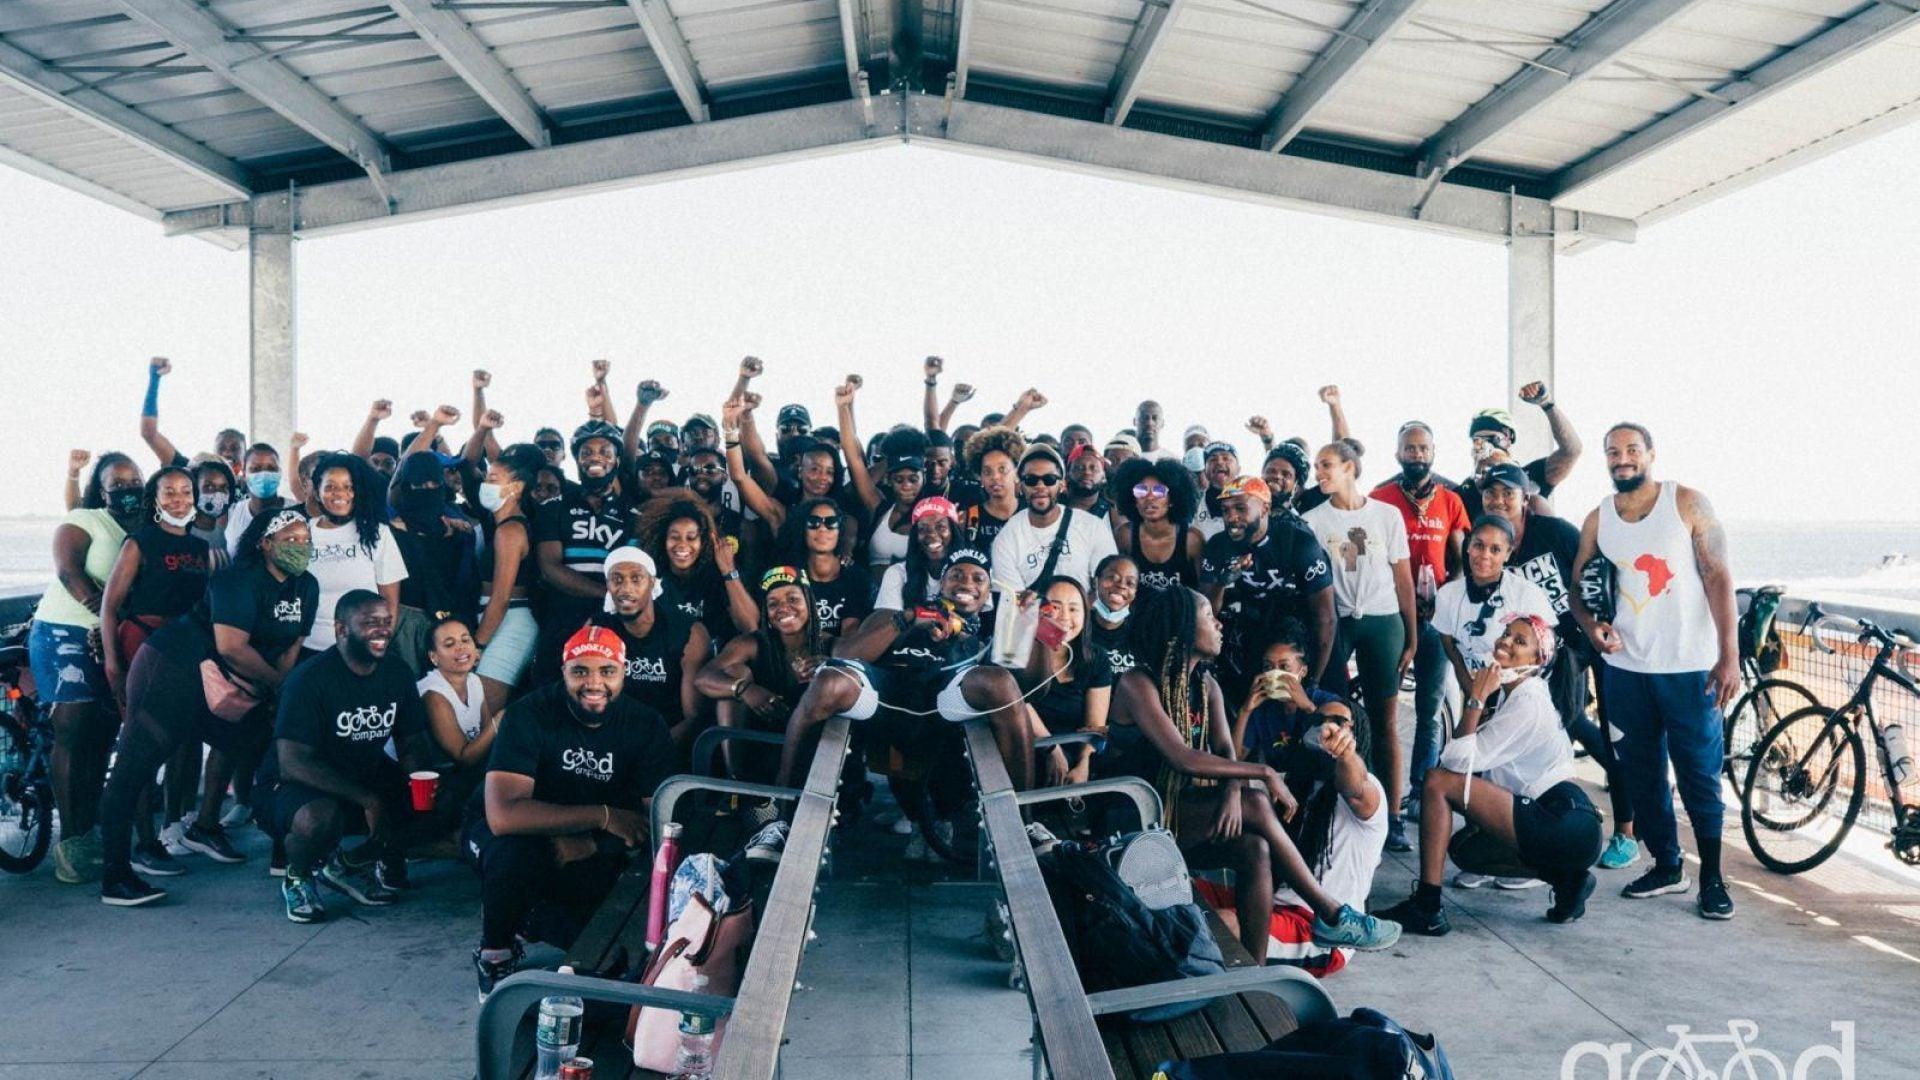 Black Joy On Wheels: Brooklyn Friends Launch A Pandemic Bike Club and A Powerful Movement